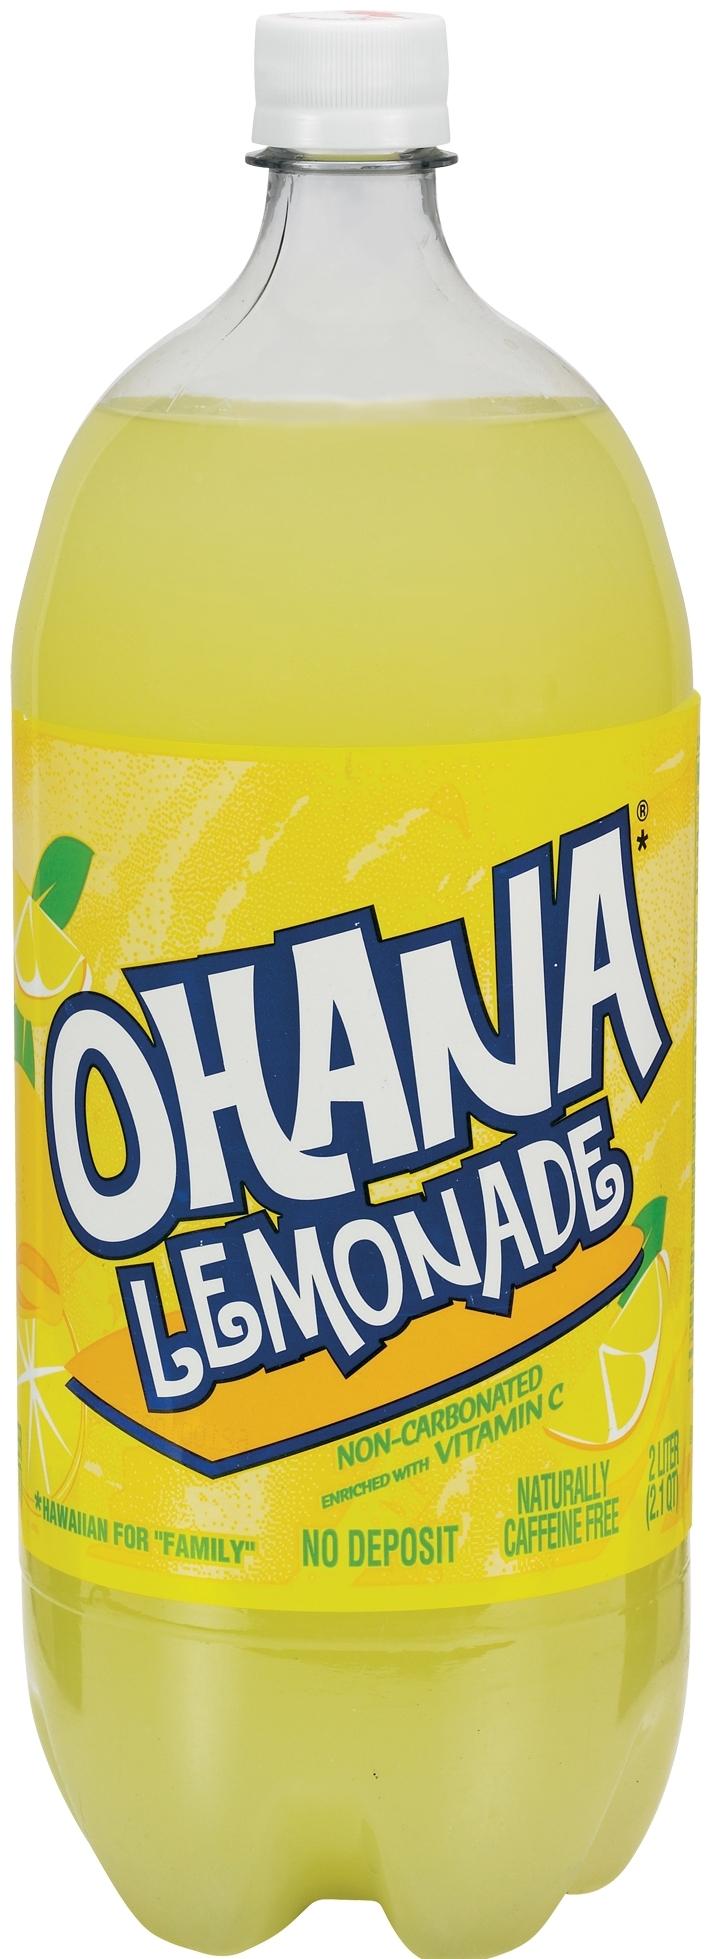 2 L Ohana Lemonade.JPG